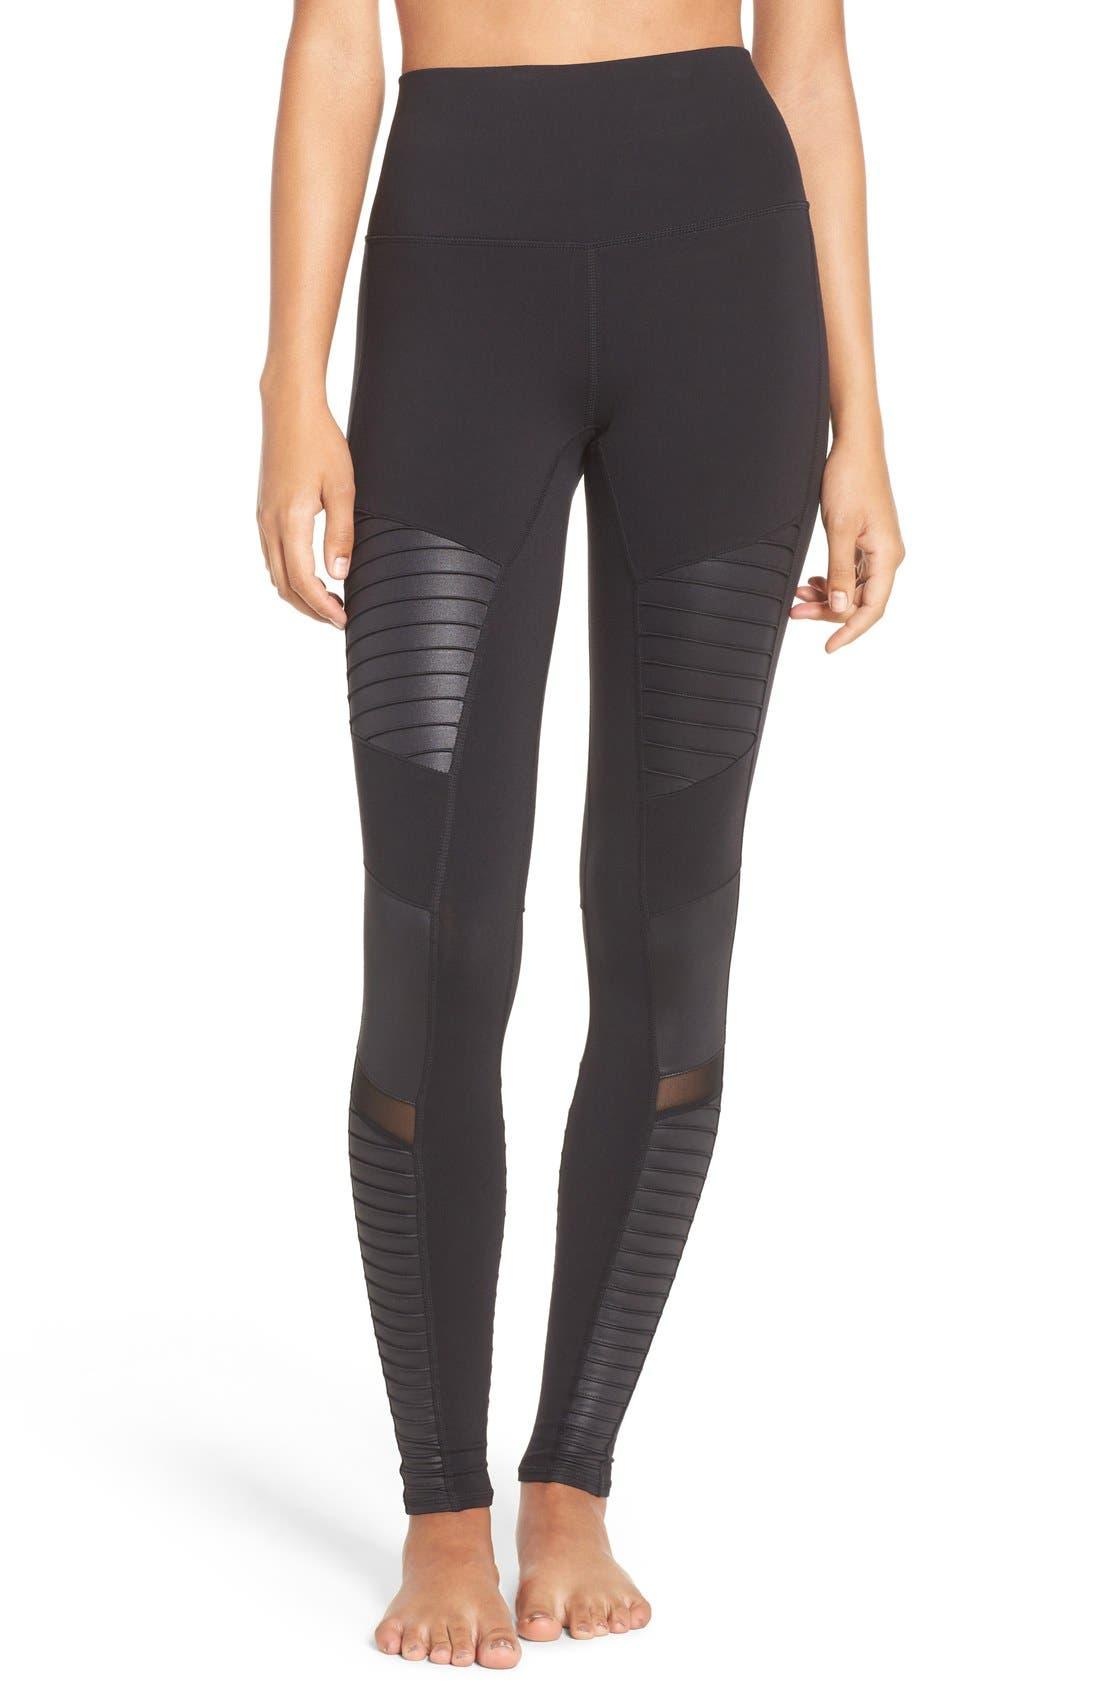 High Waist Moto Leggings,                         Main,                         color, Black/ Black Glossy